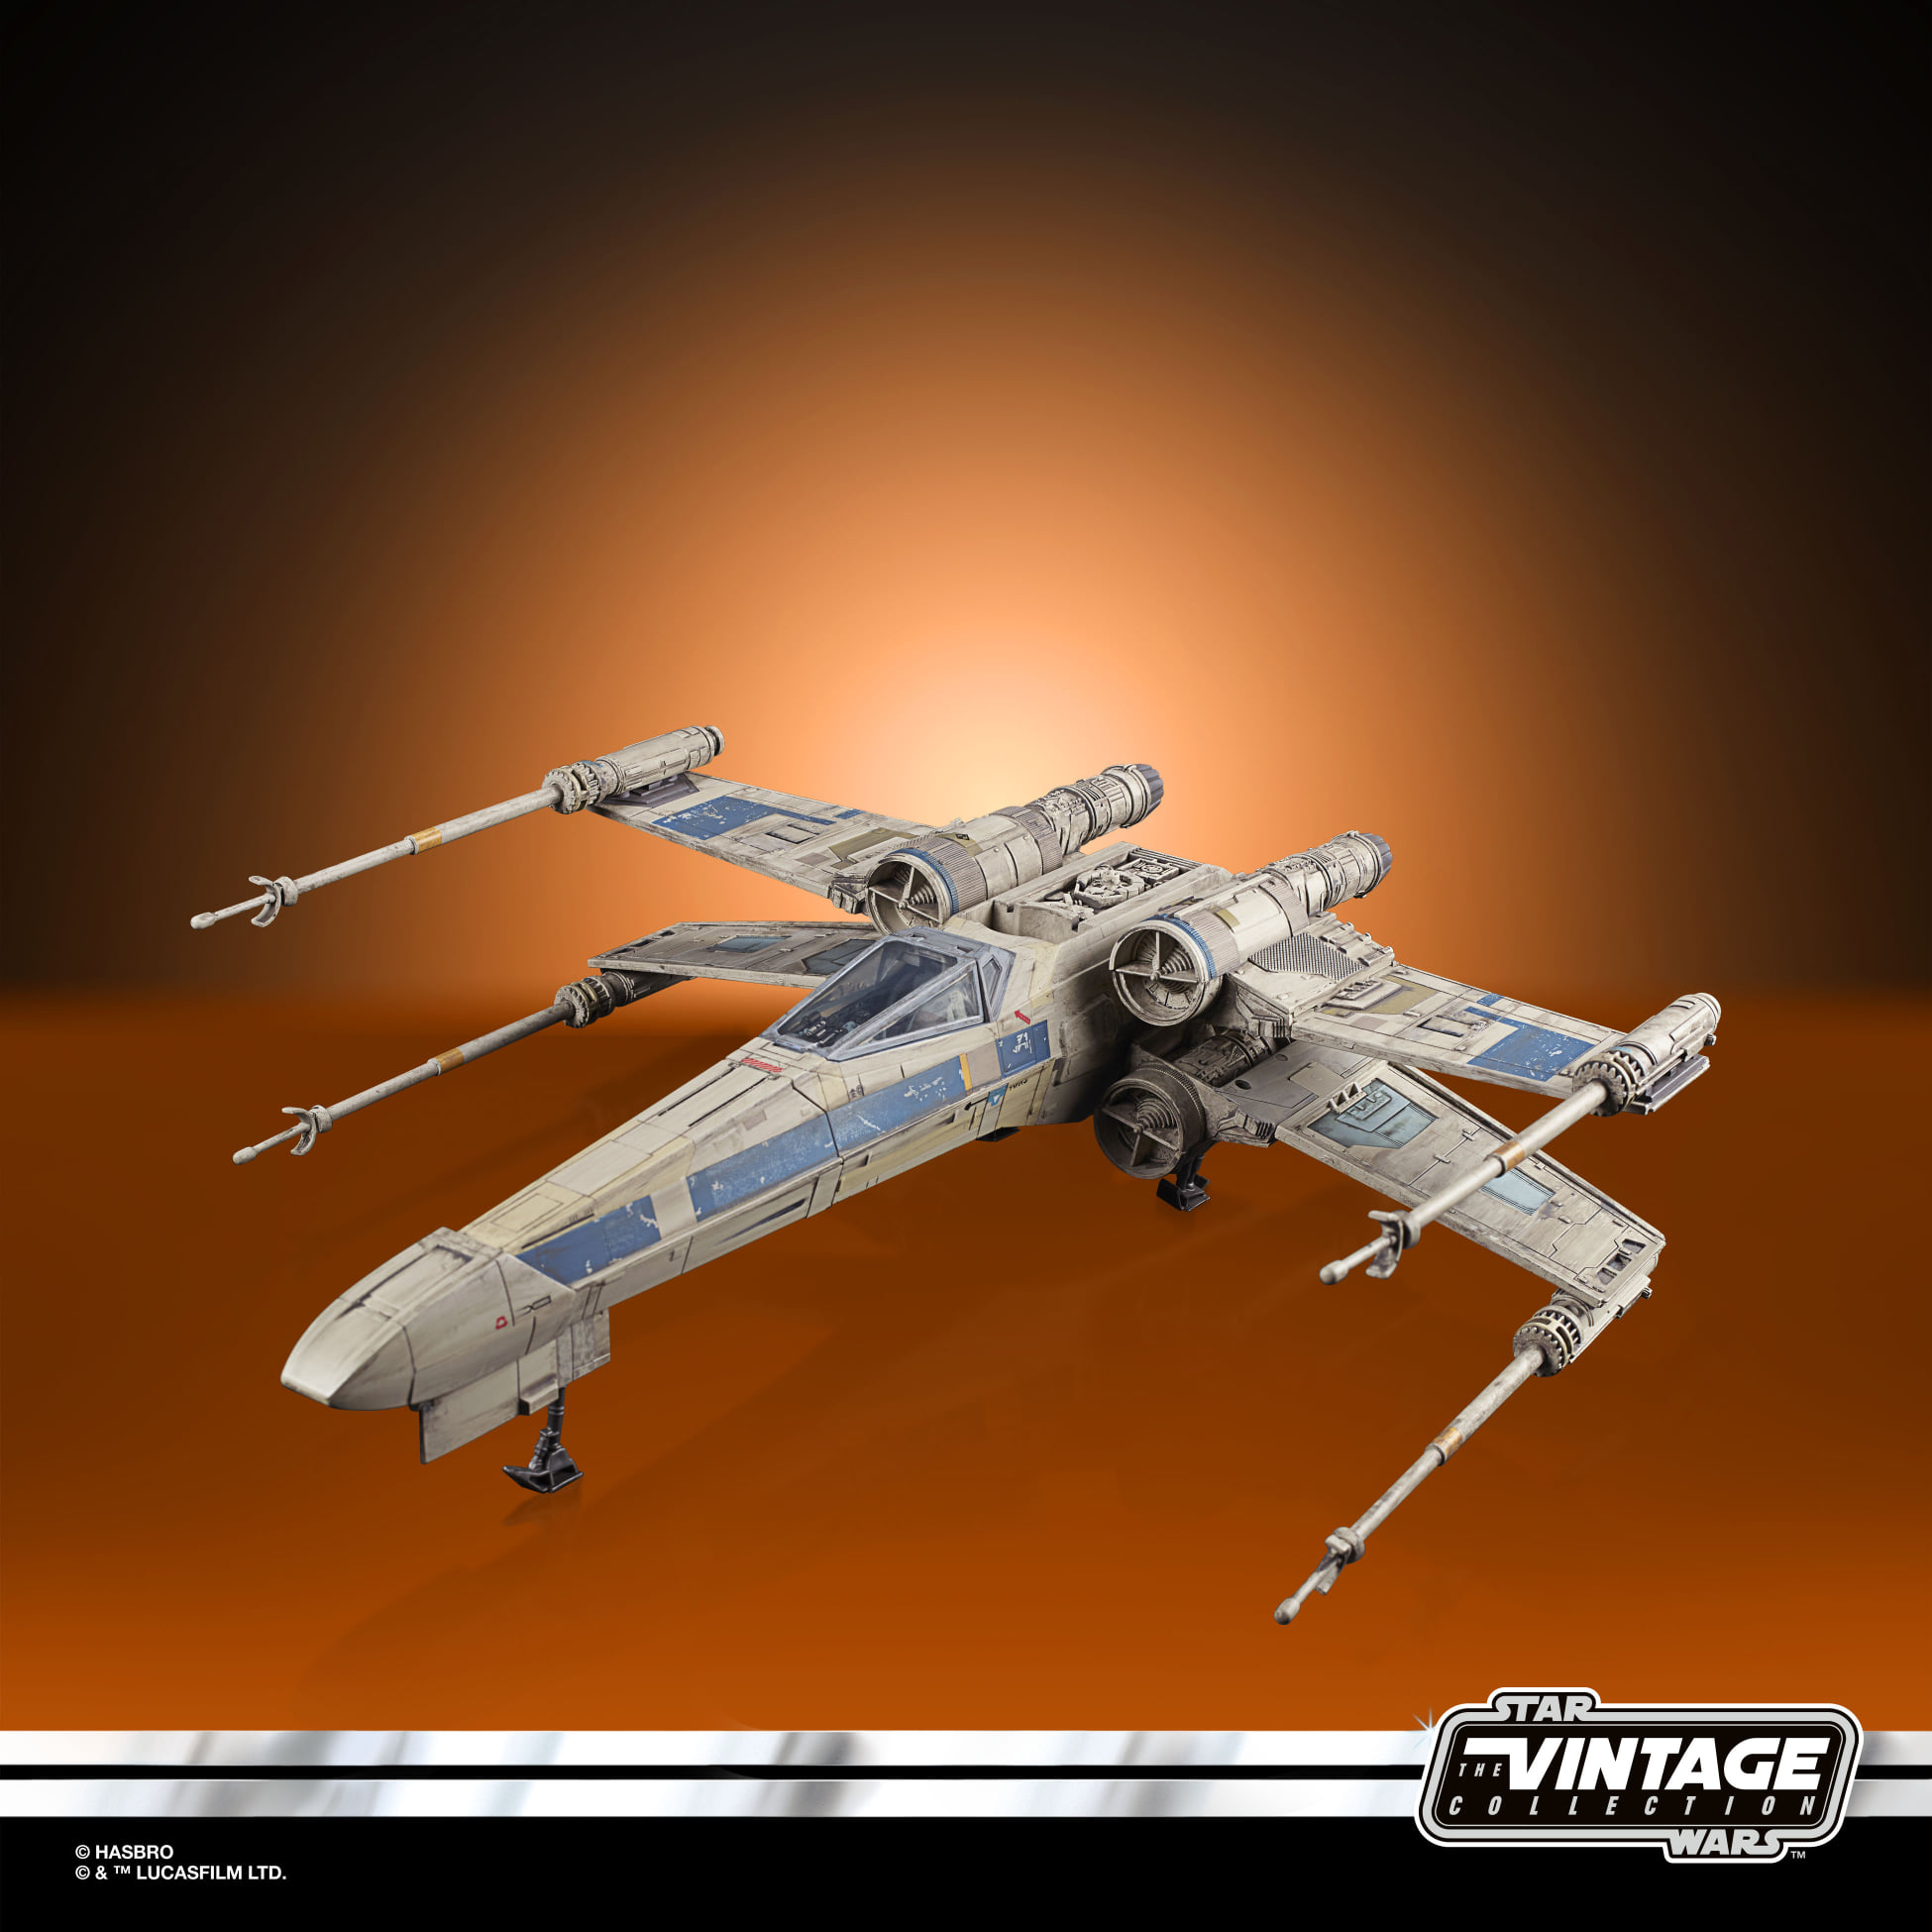 Antoc Merrick's X-Wing